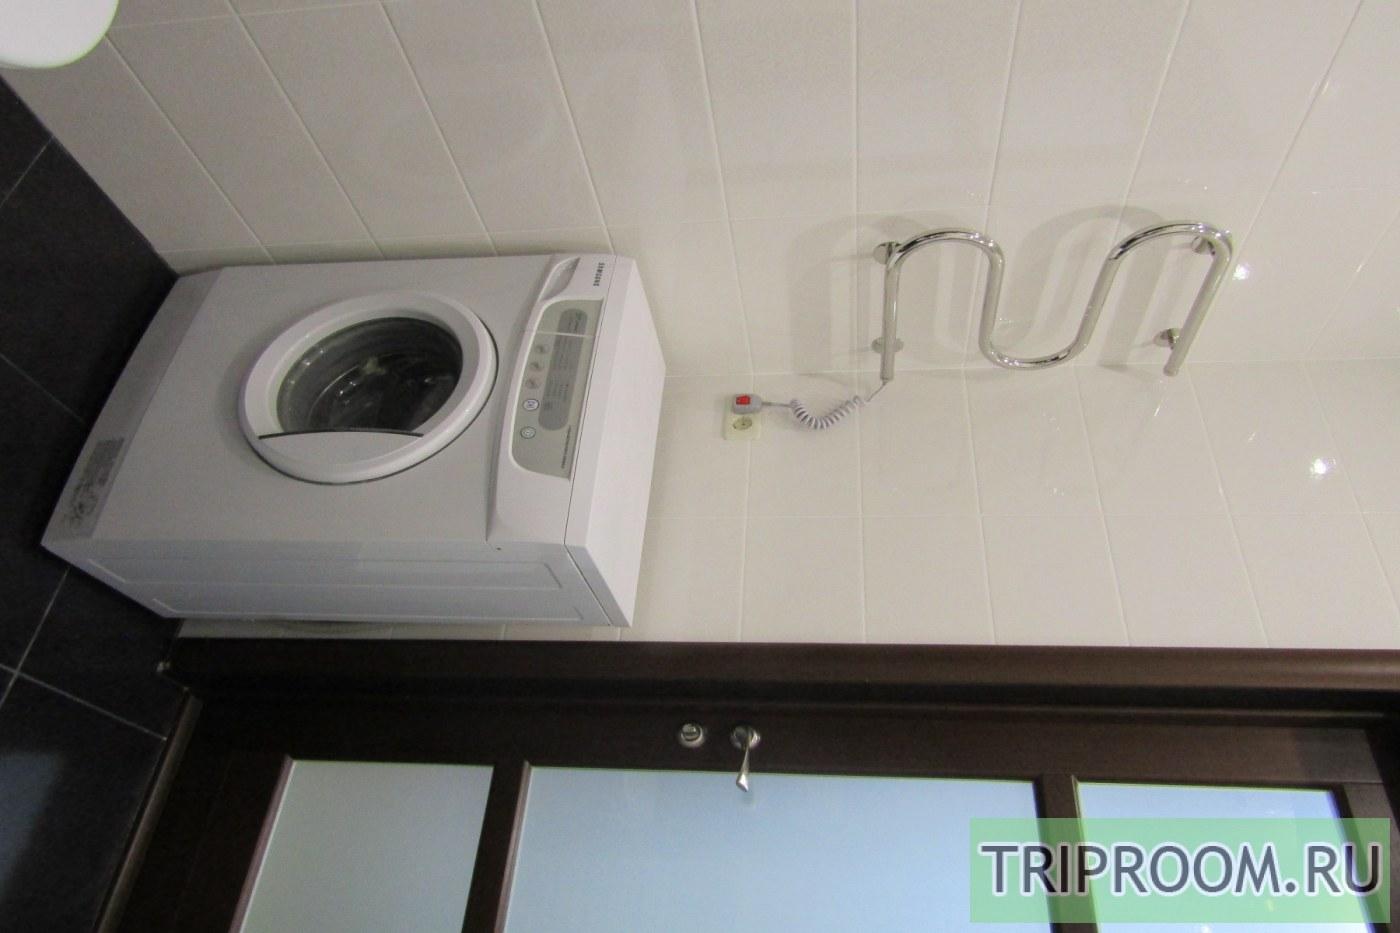 1-комнатная квартира посуточно (вариант № 37389), ул. Лозицкой улица, фото № 5